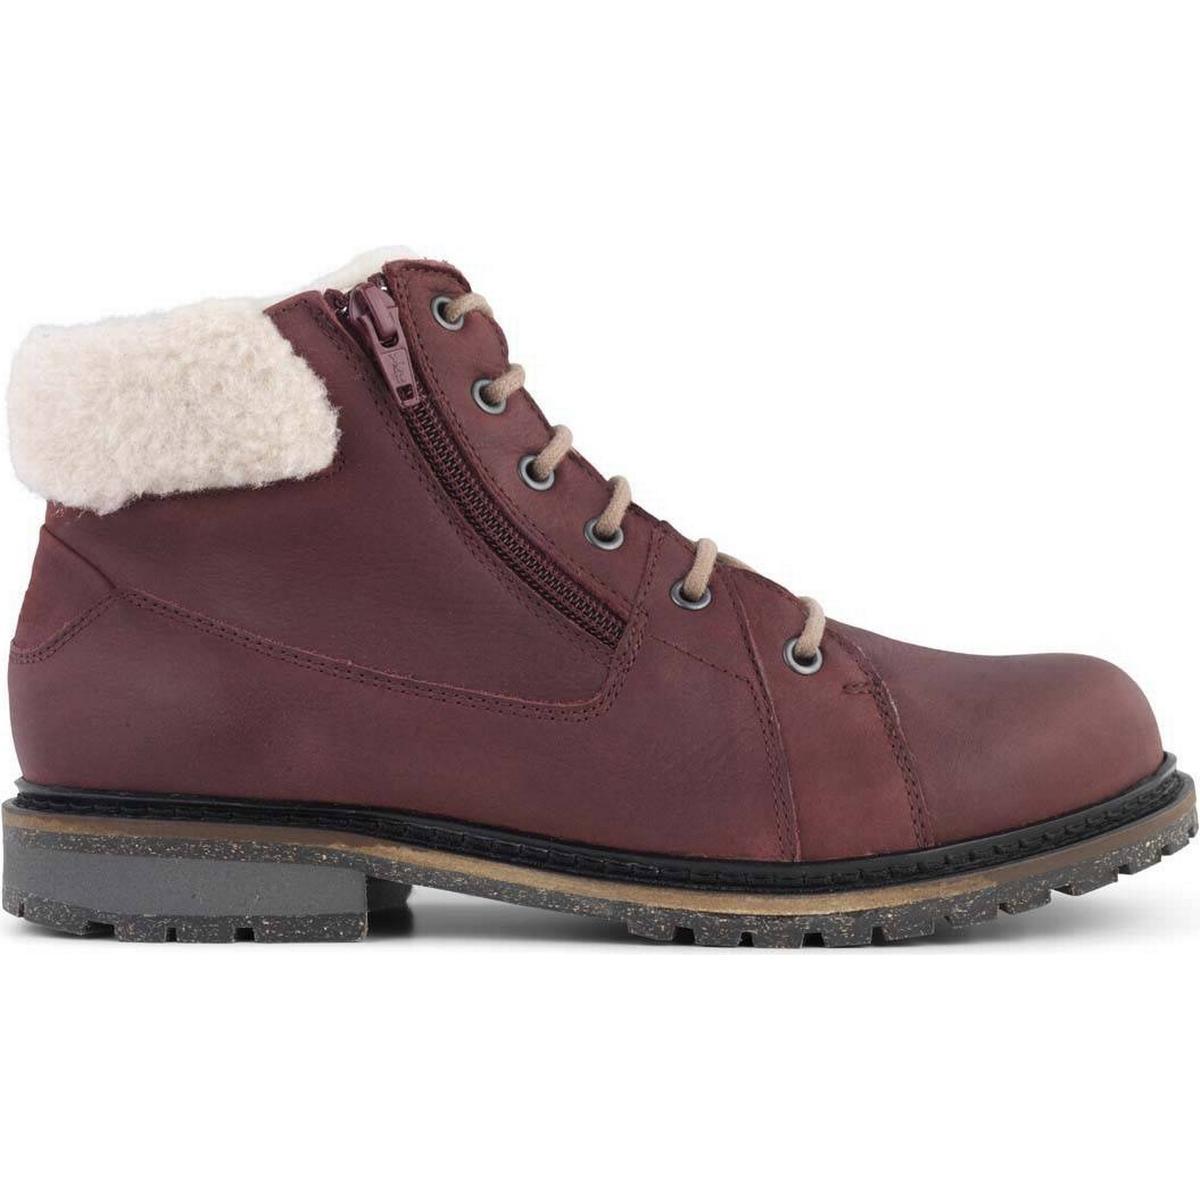 ba95defa830 New Feet Lav hæl Sko - Sammenlign priser hos PriceRunner